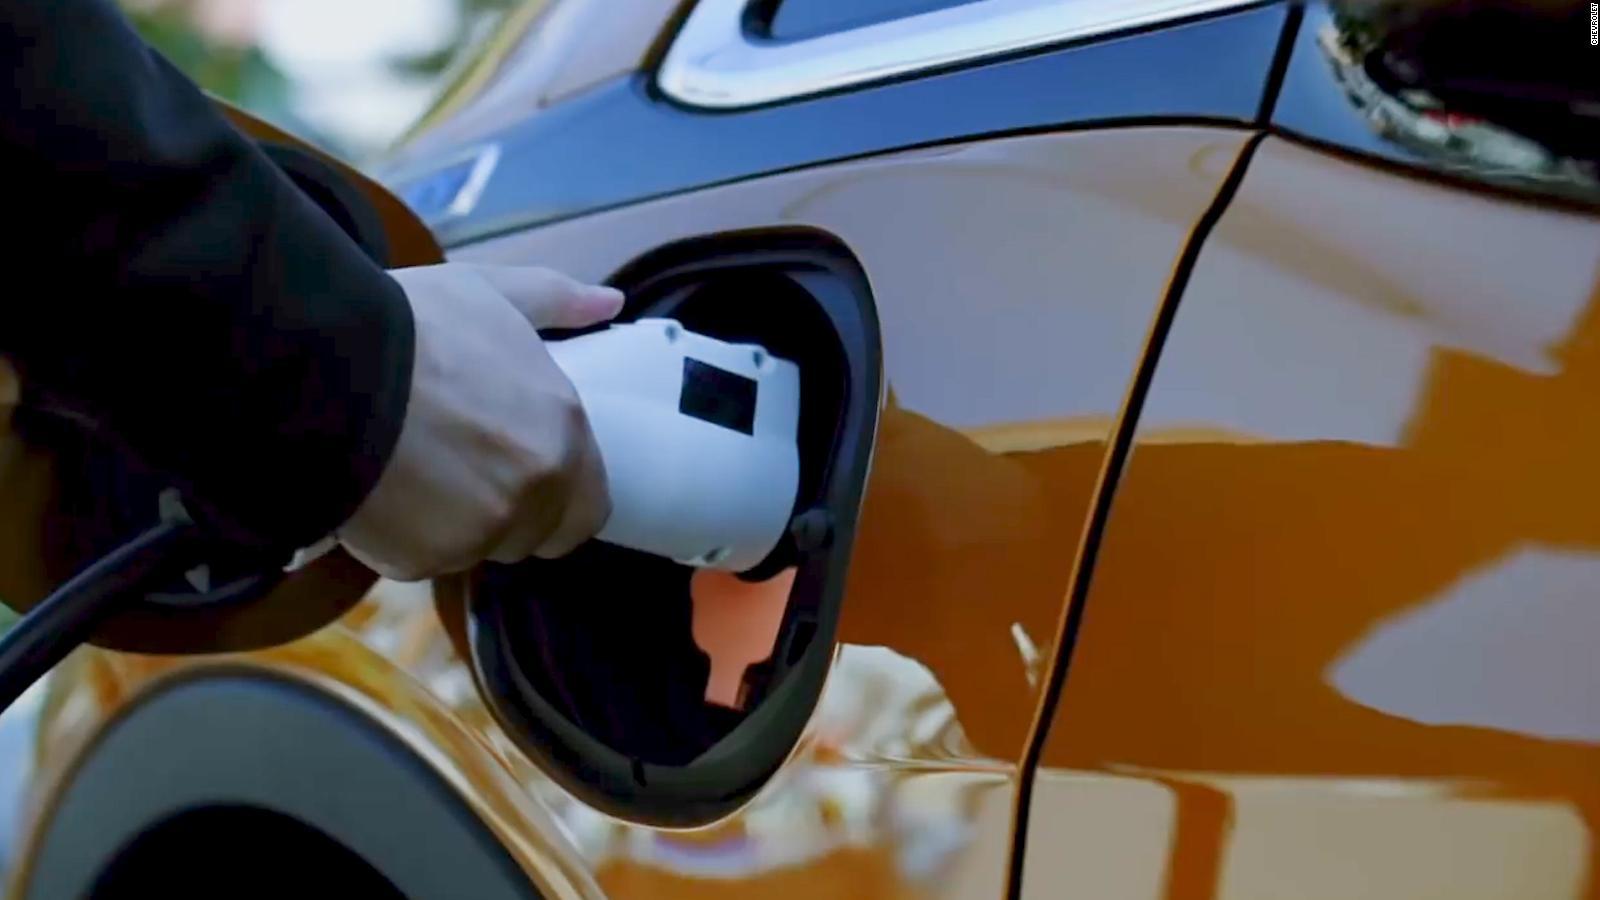 Gm Unveils Its Next Big Electric Vehicle The Tiny Bolt Euv Cnn